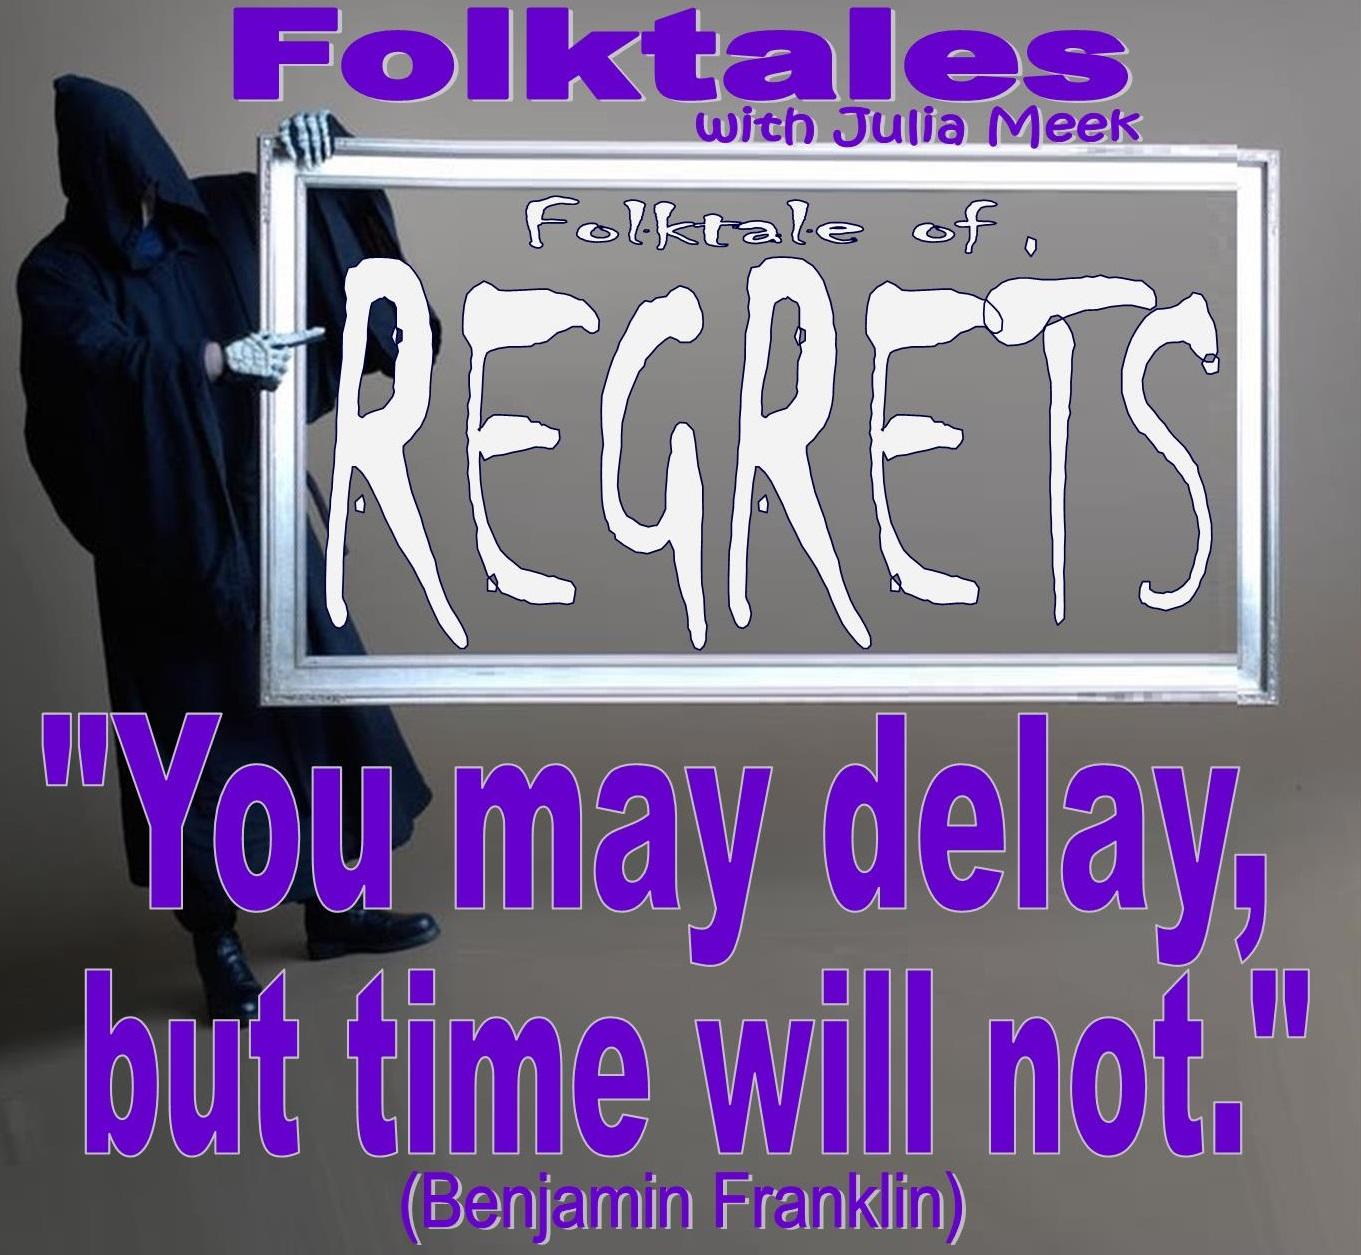 Caption: Folktale of Regrets, Credit: Julia Meek